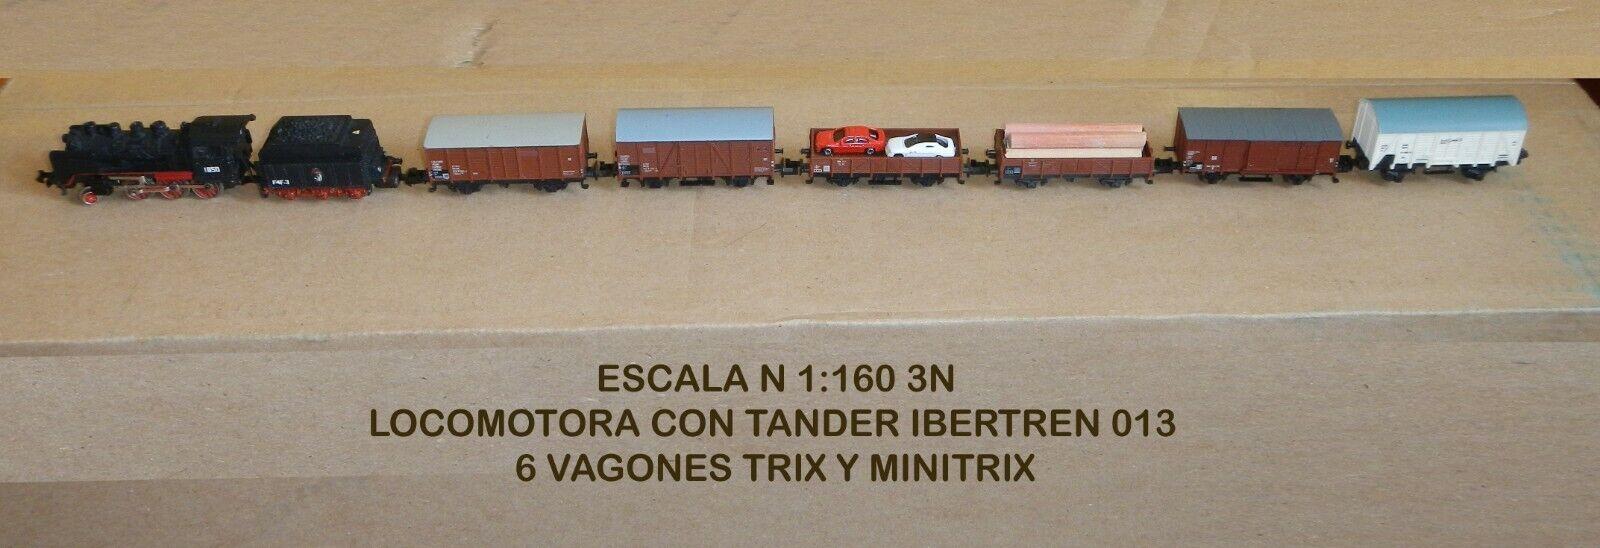 LOCOMOTORA IBERTREN 013 + 6 VAGONES TRIX Y MINITRIX ESCALA 1 160 TRENES ESPAÑA